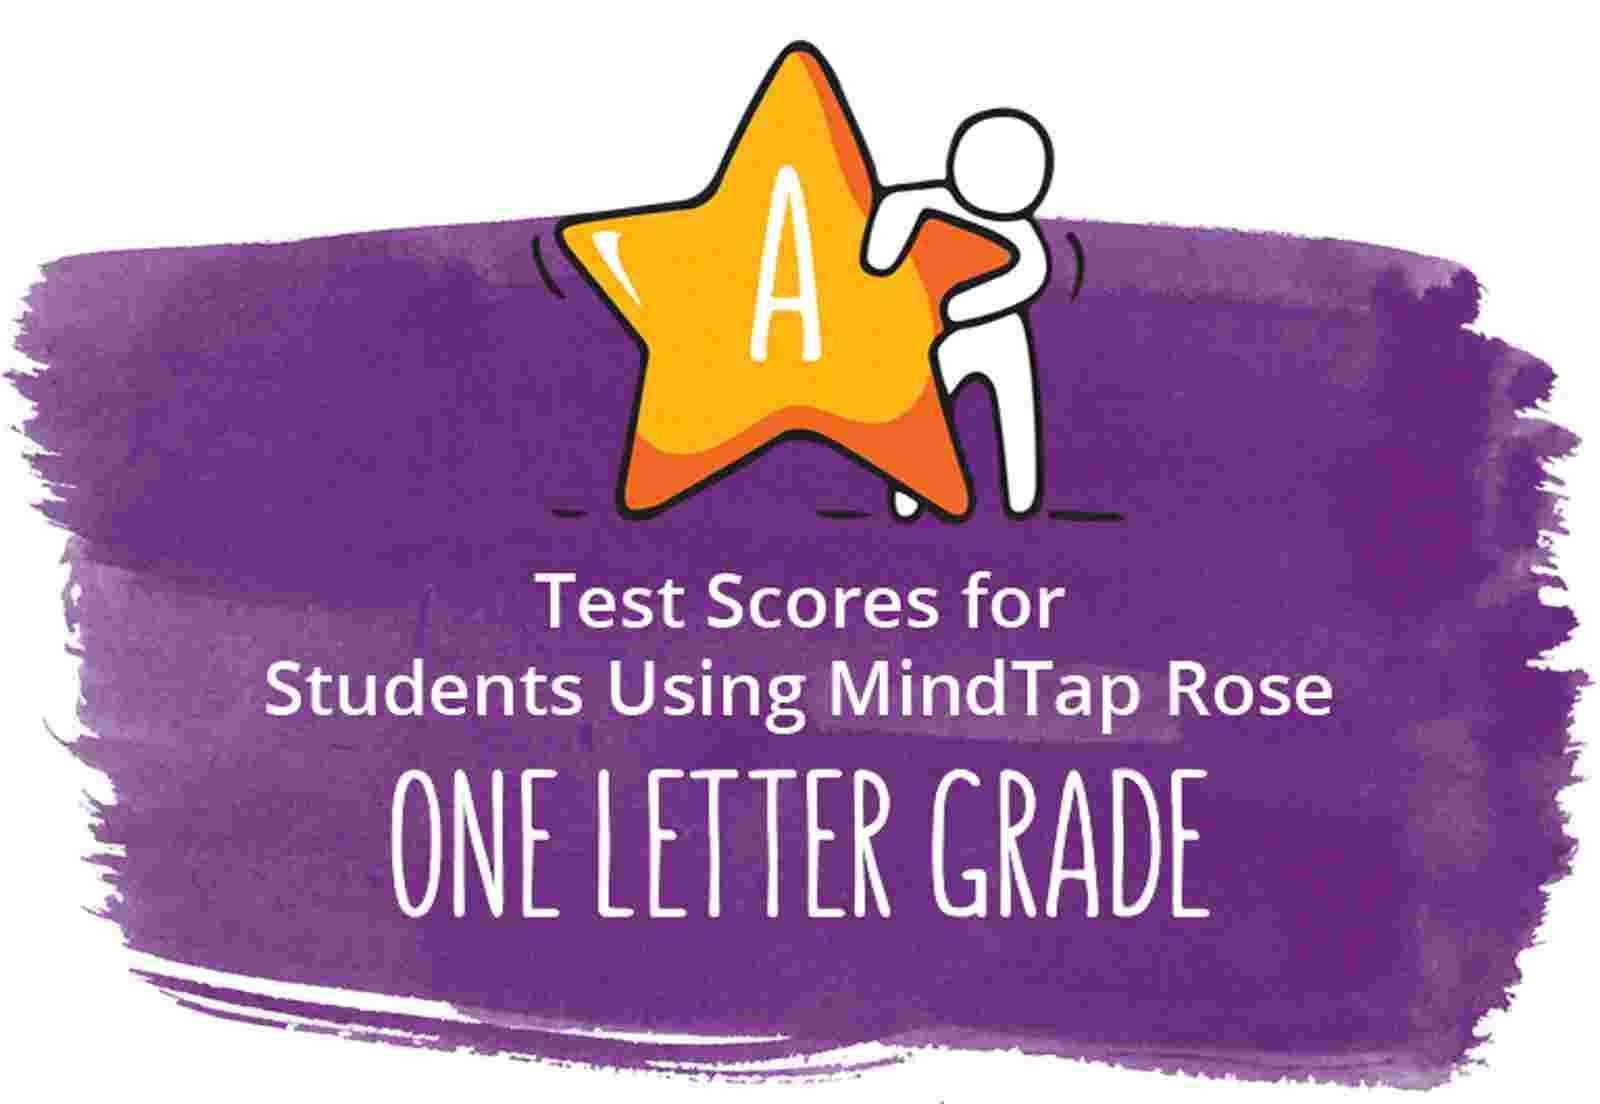 Test scores improved 11%